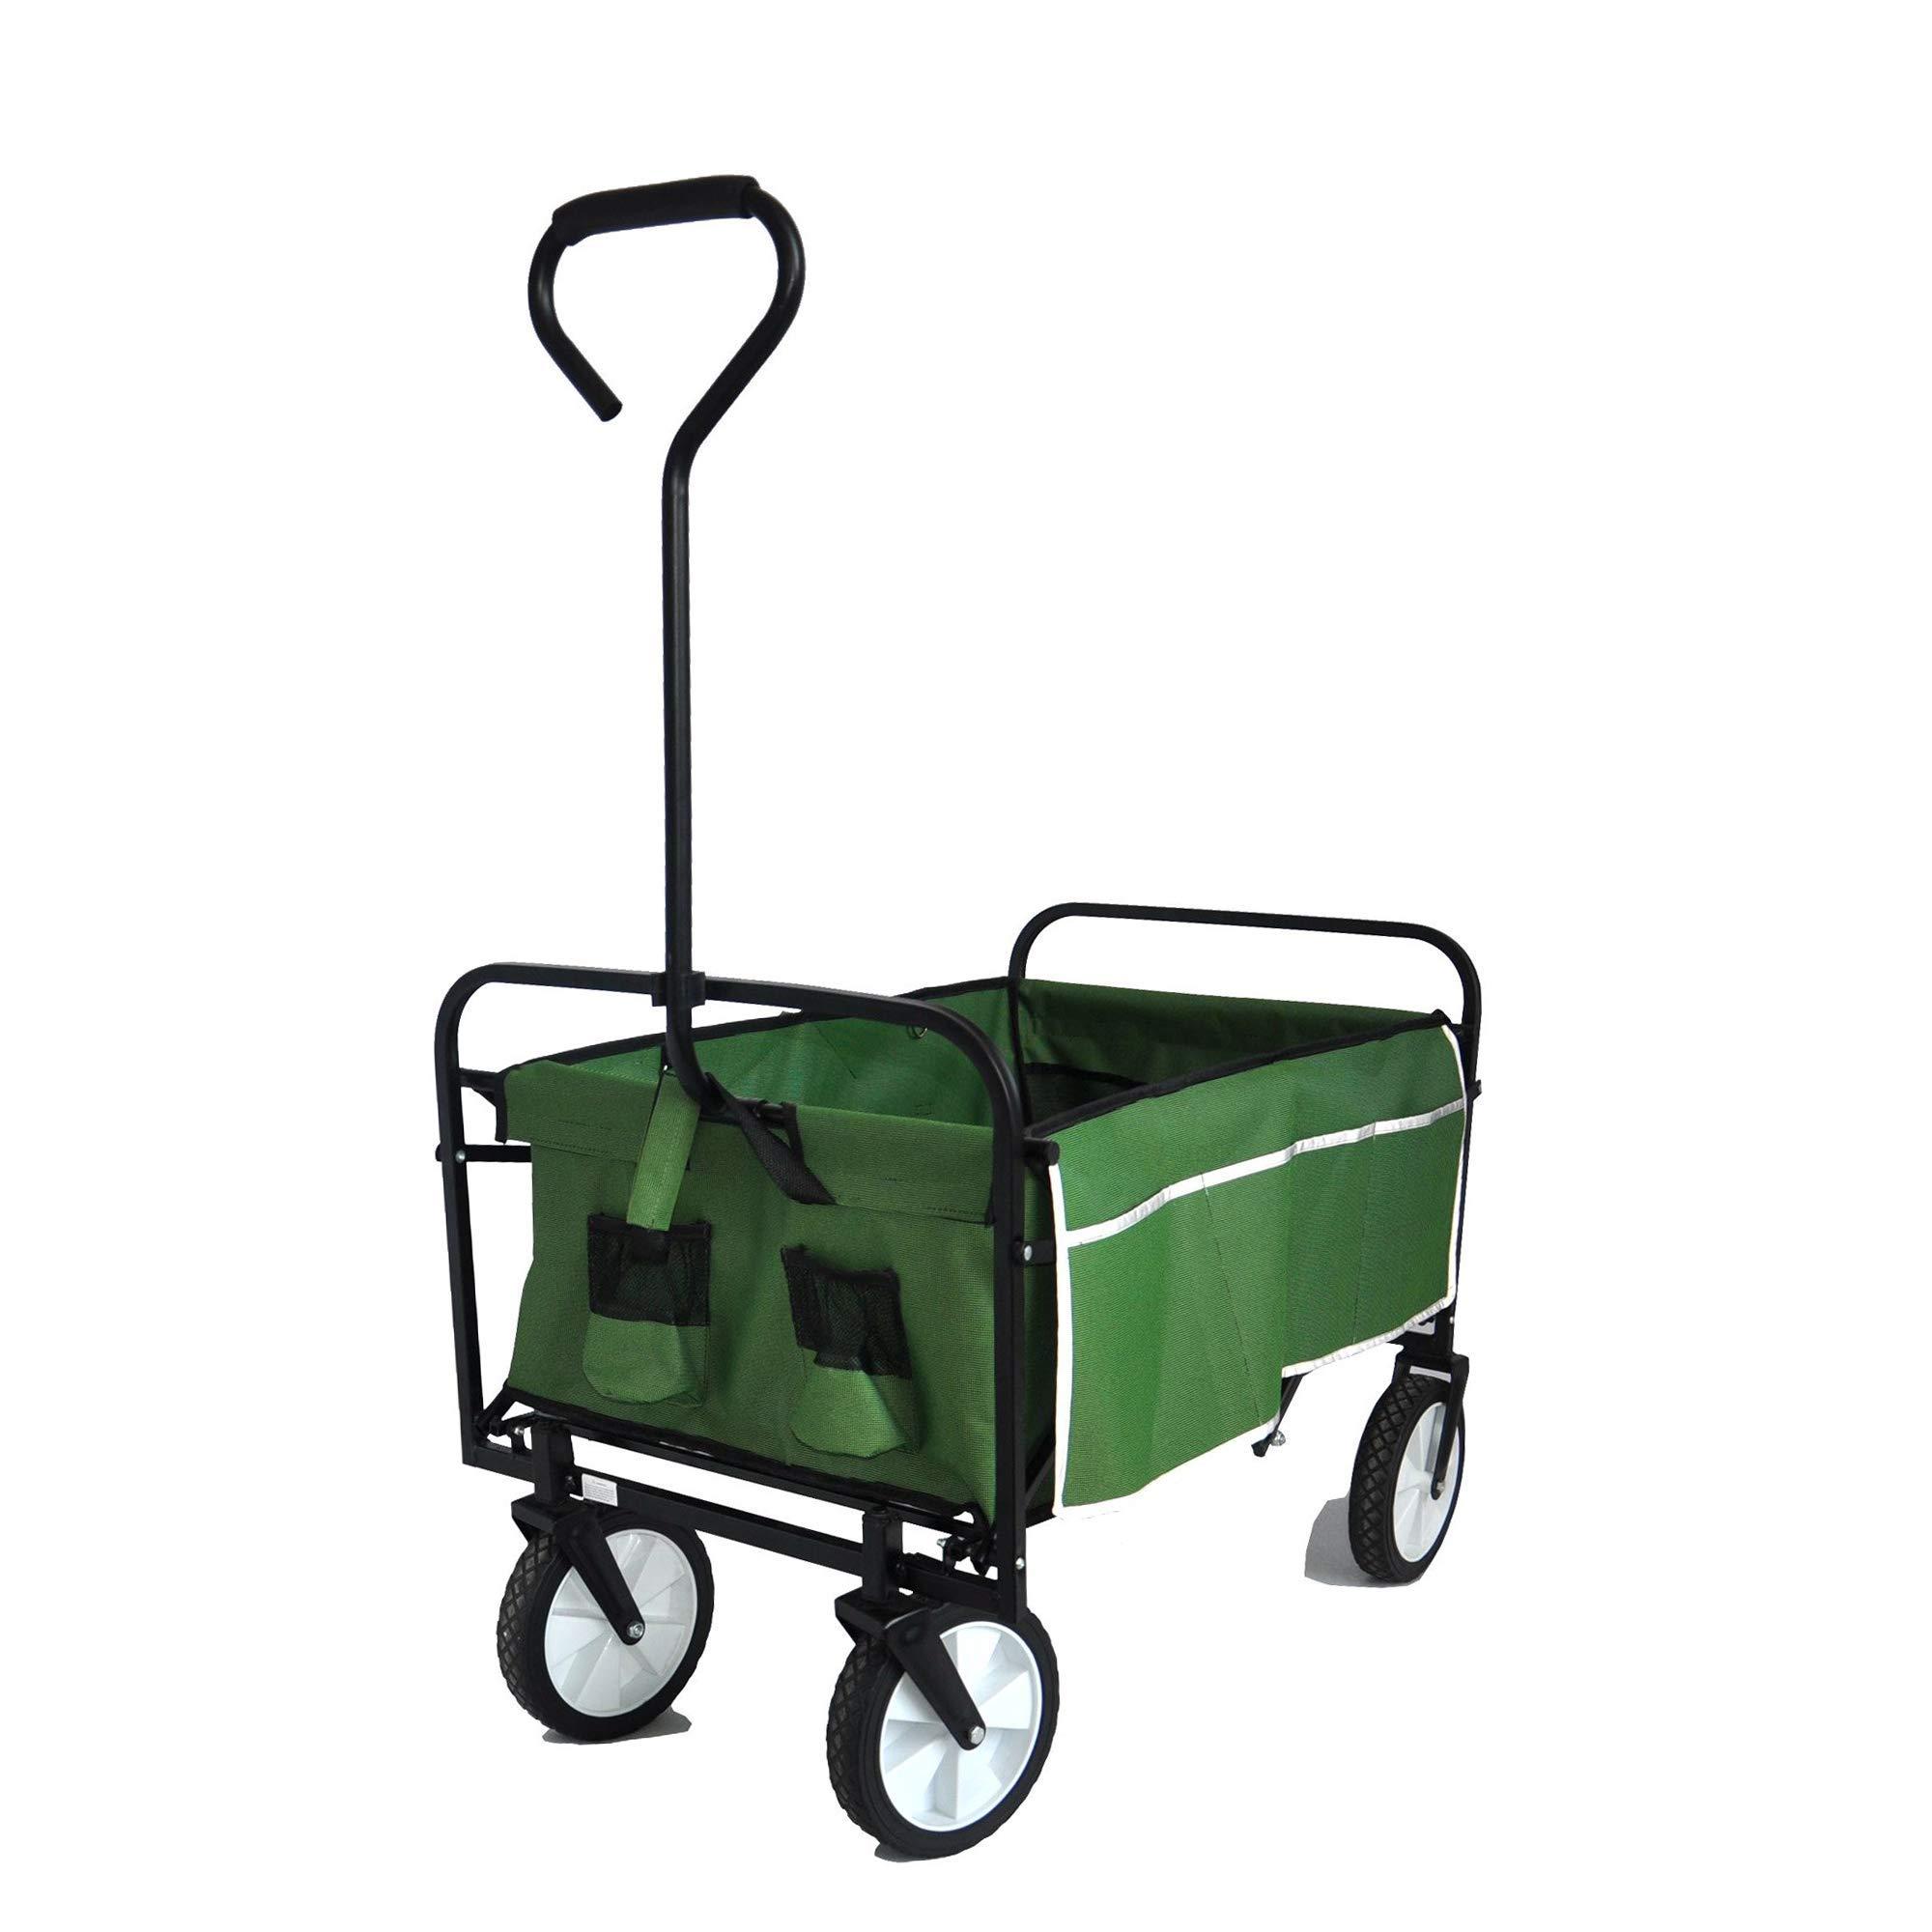 ALI VIRGO Folding Collapsible Outdoor Utility, Garden Shopping Cart Beach Camping Wagon with All-Terrain Wheels, Green by ALI VIRGO